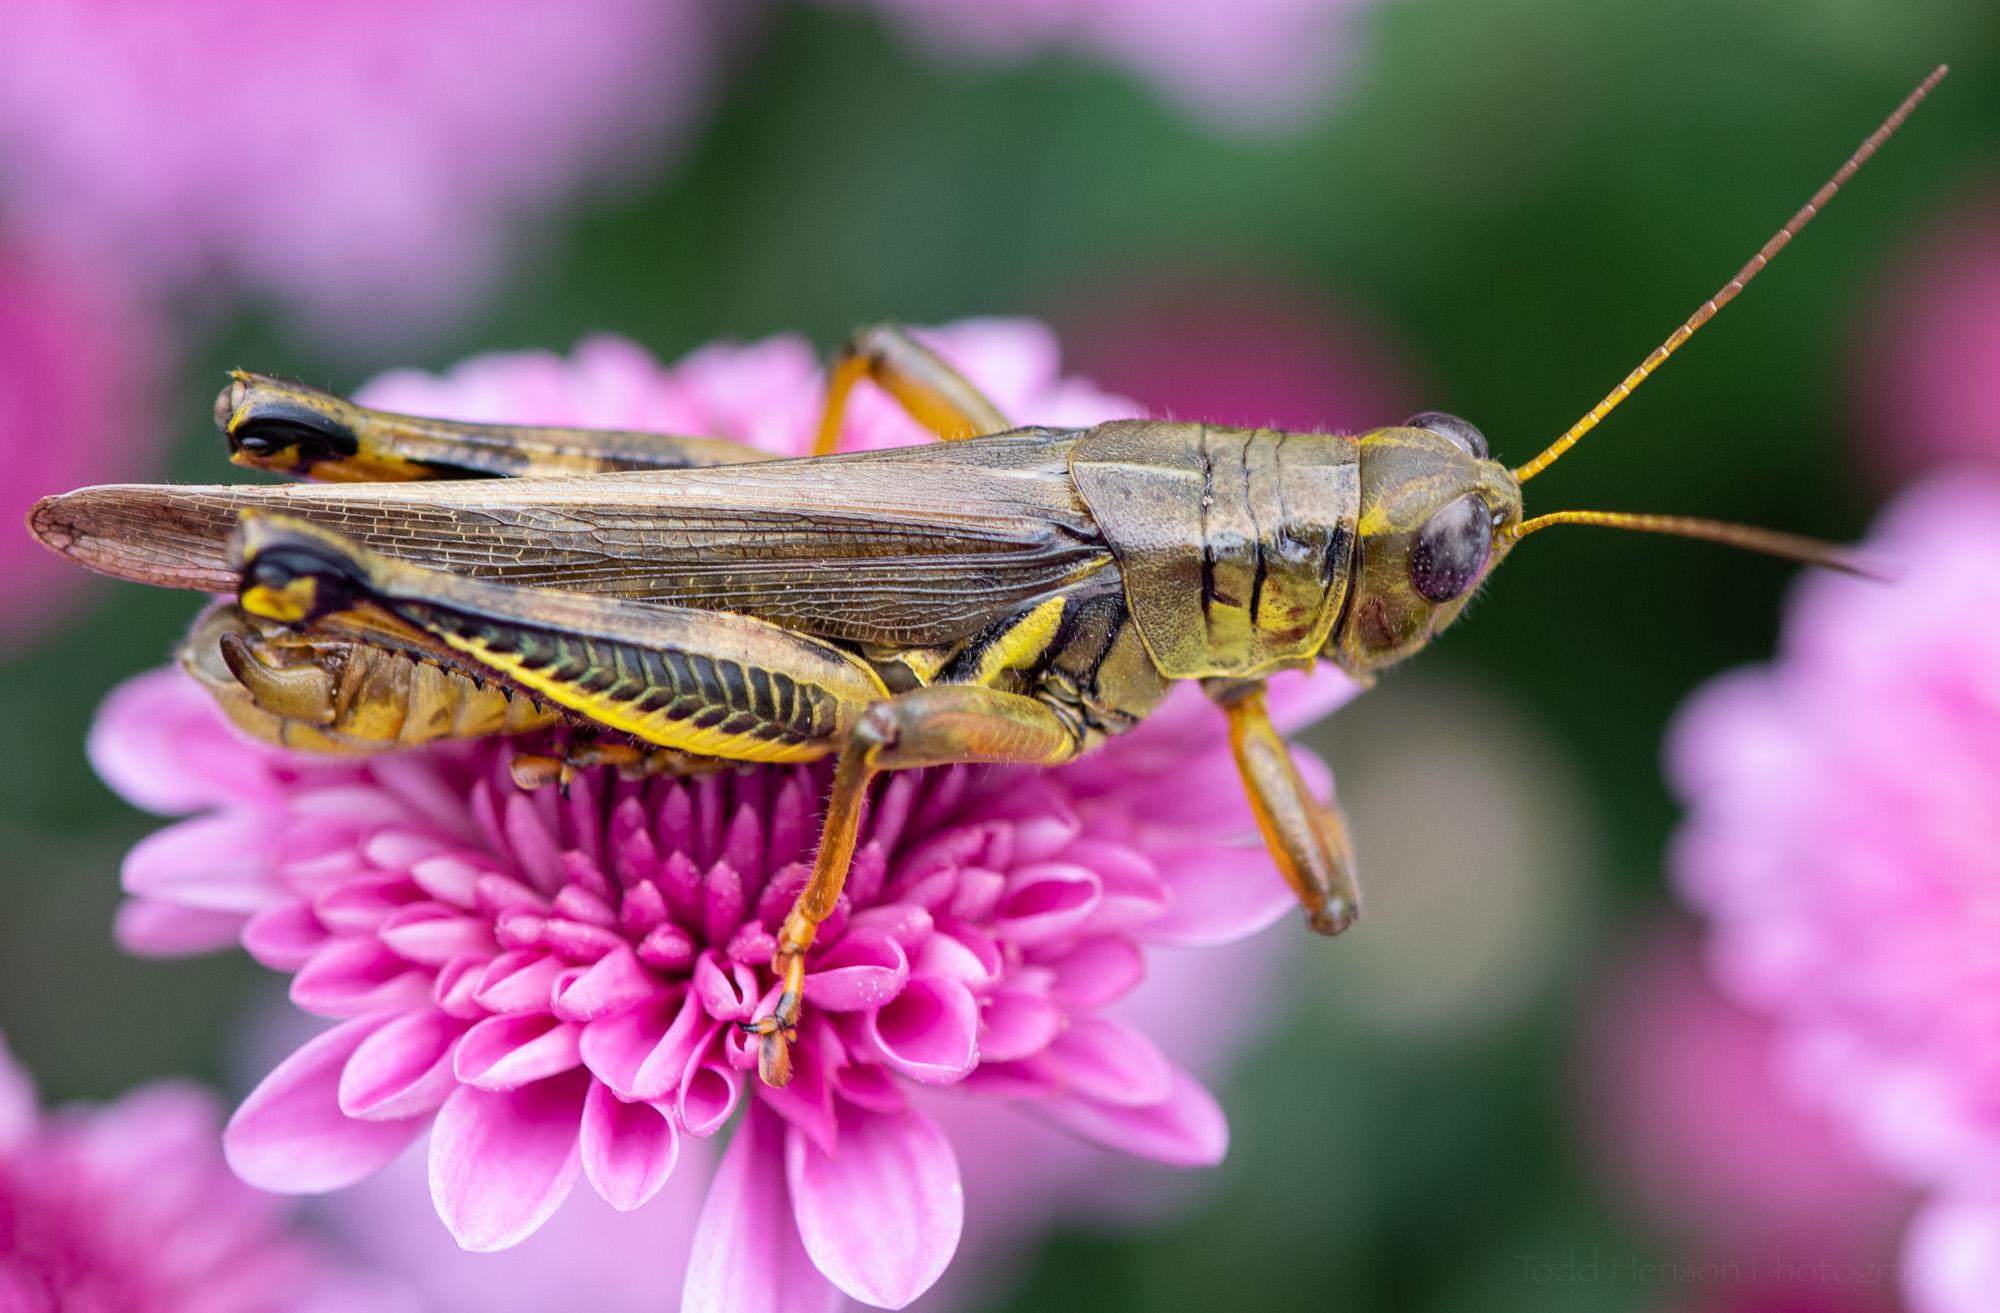 A grasshopper perched on a pink chrysanthemum.